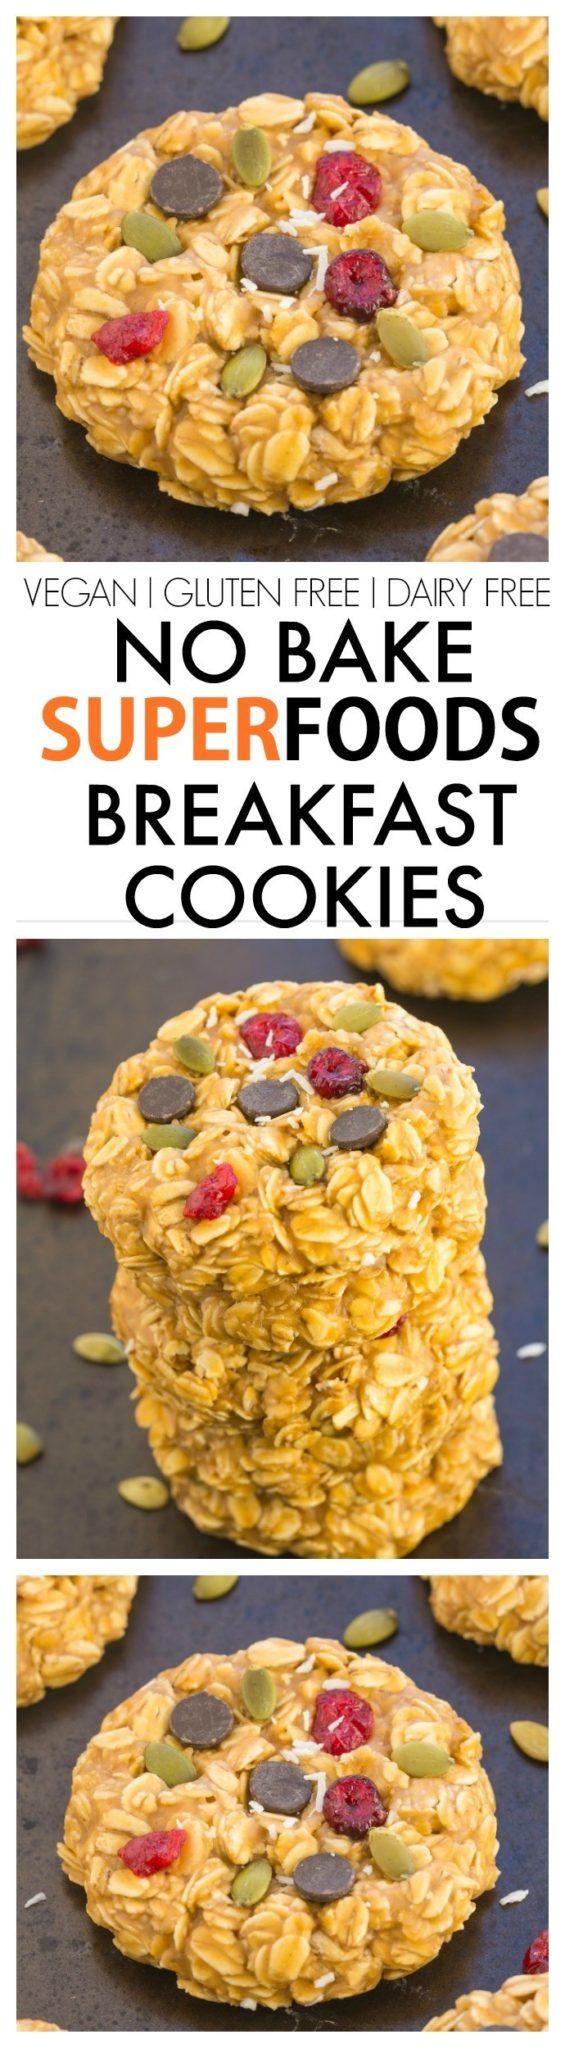 Healthy Snacks - No Bake SUPERFOODS Breakfast Cookies Recipe - Vegan - Gluten-Free - Dairy-Free Treats via The Big Mans World